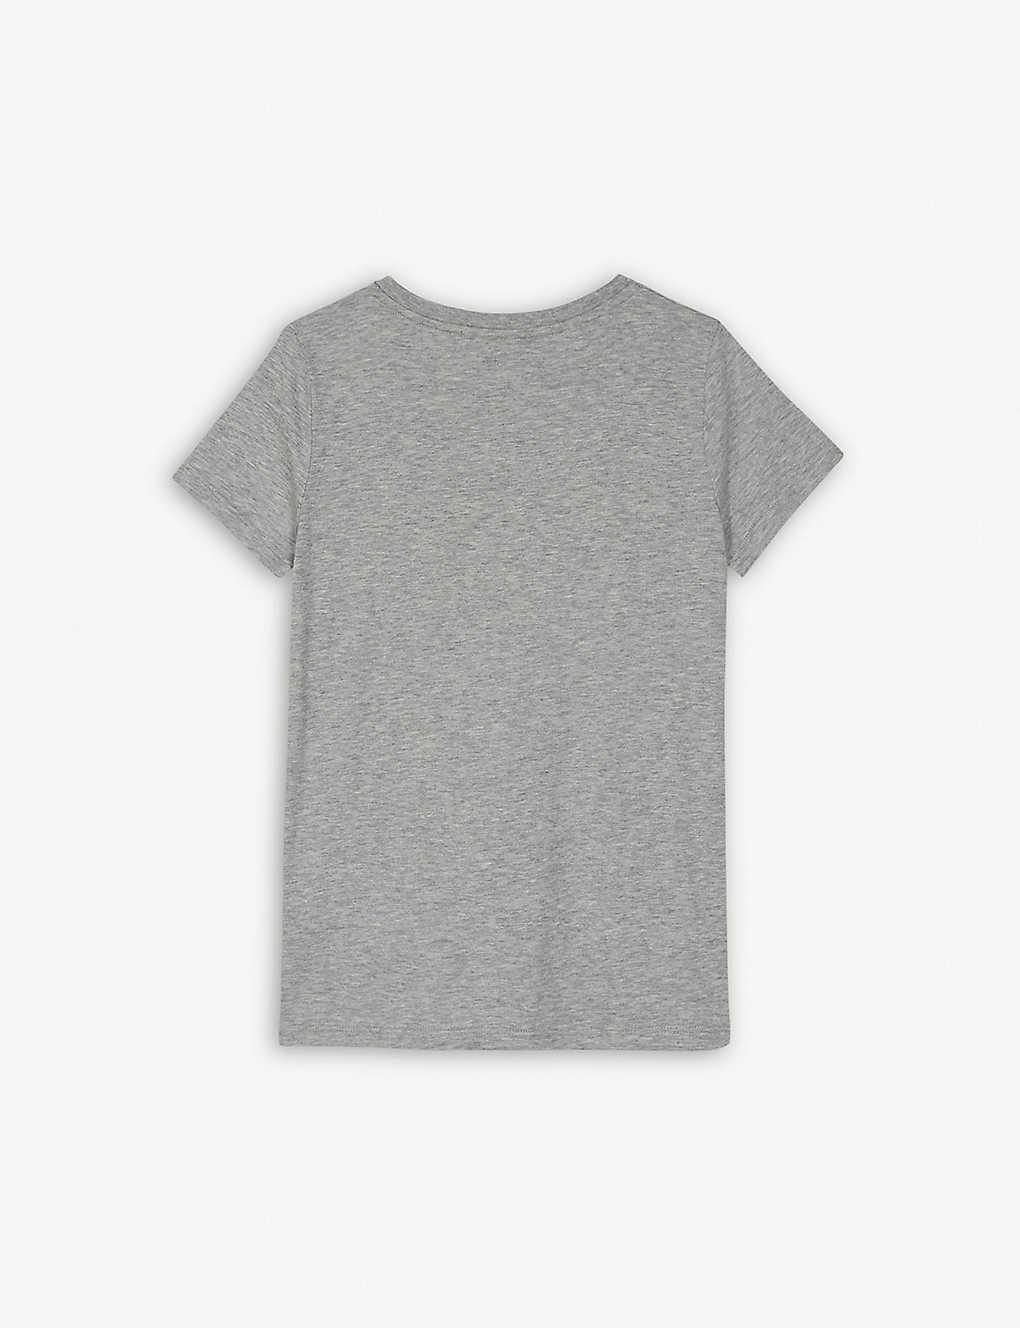 ffb0a7b83f1f GUCCI - Butterfly-print cotton T-shirt 4-16 years | Selfridges.com